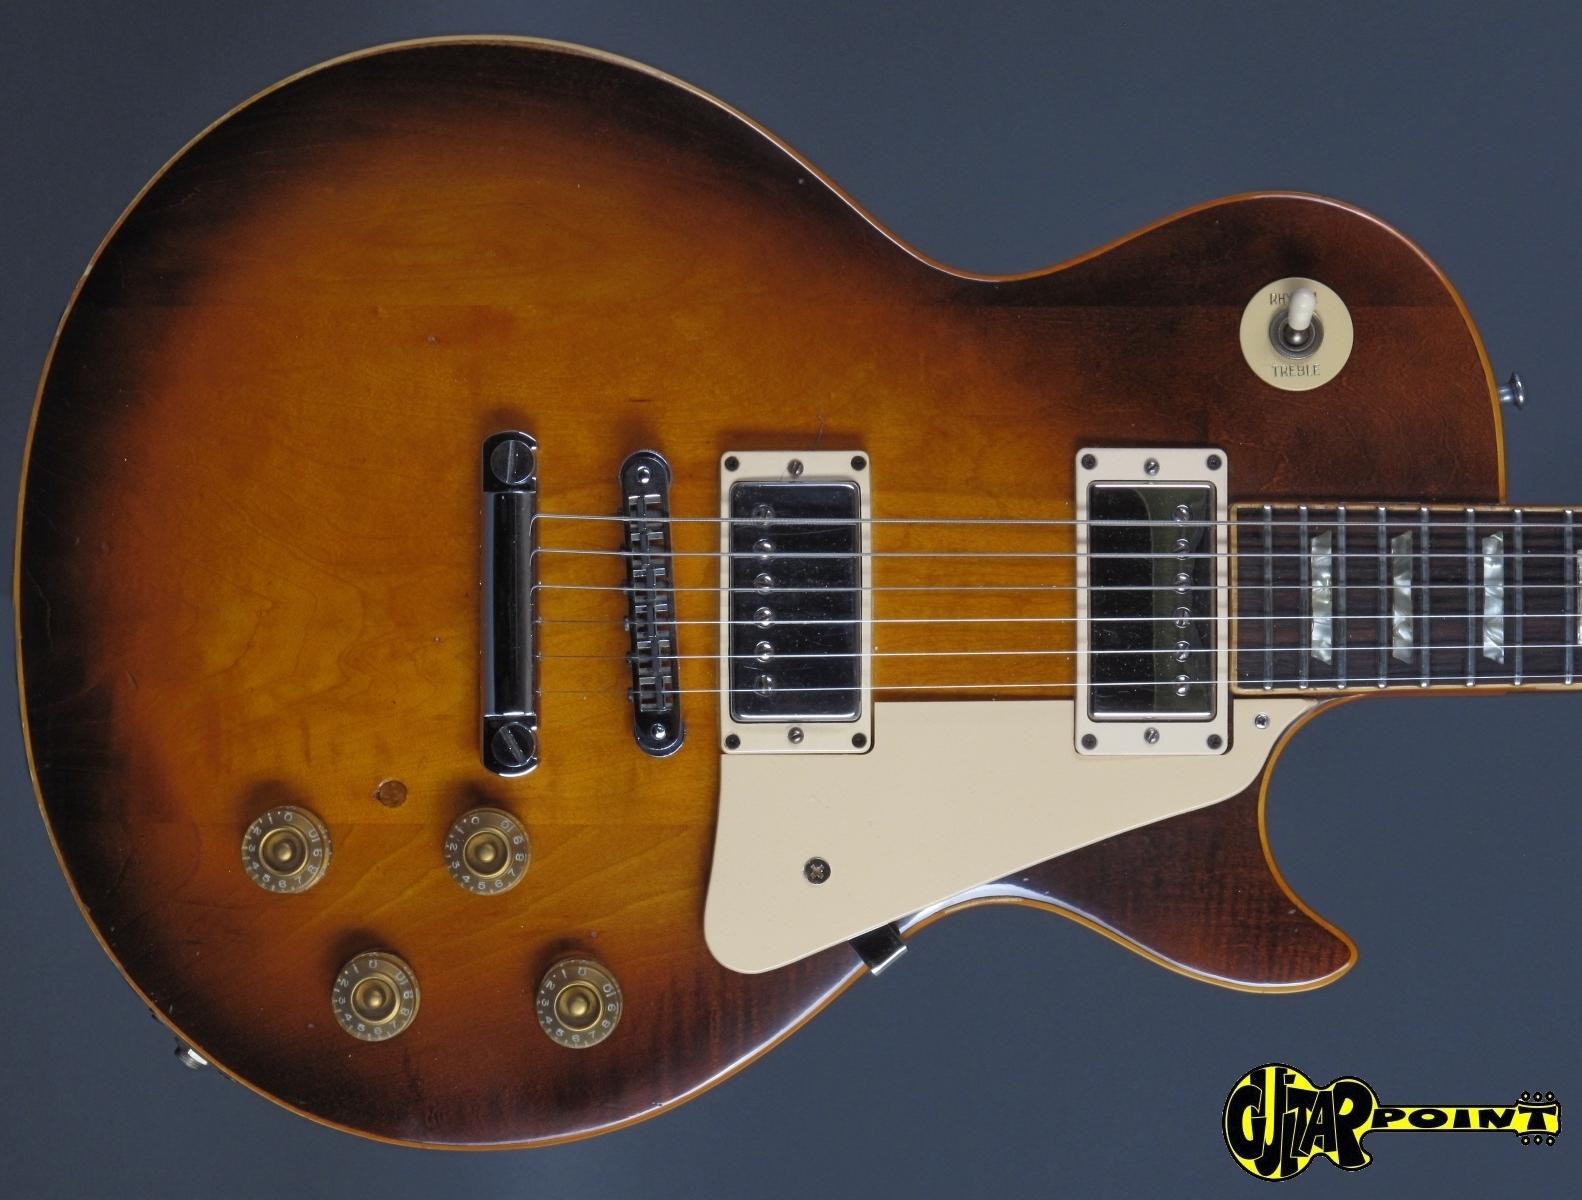 gibson les paul standard 1975 honey sunburst guitar for sale guitarpoint. Black Bedroom Furniture Sets. Home Design Ideas